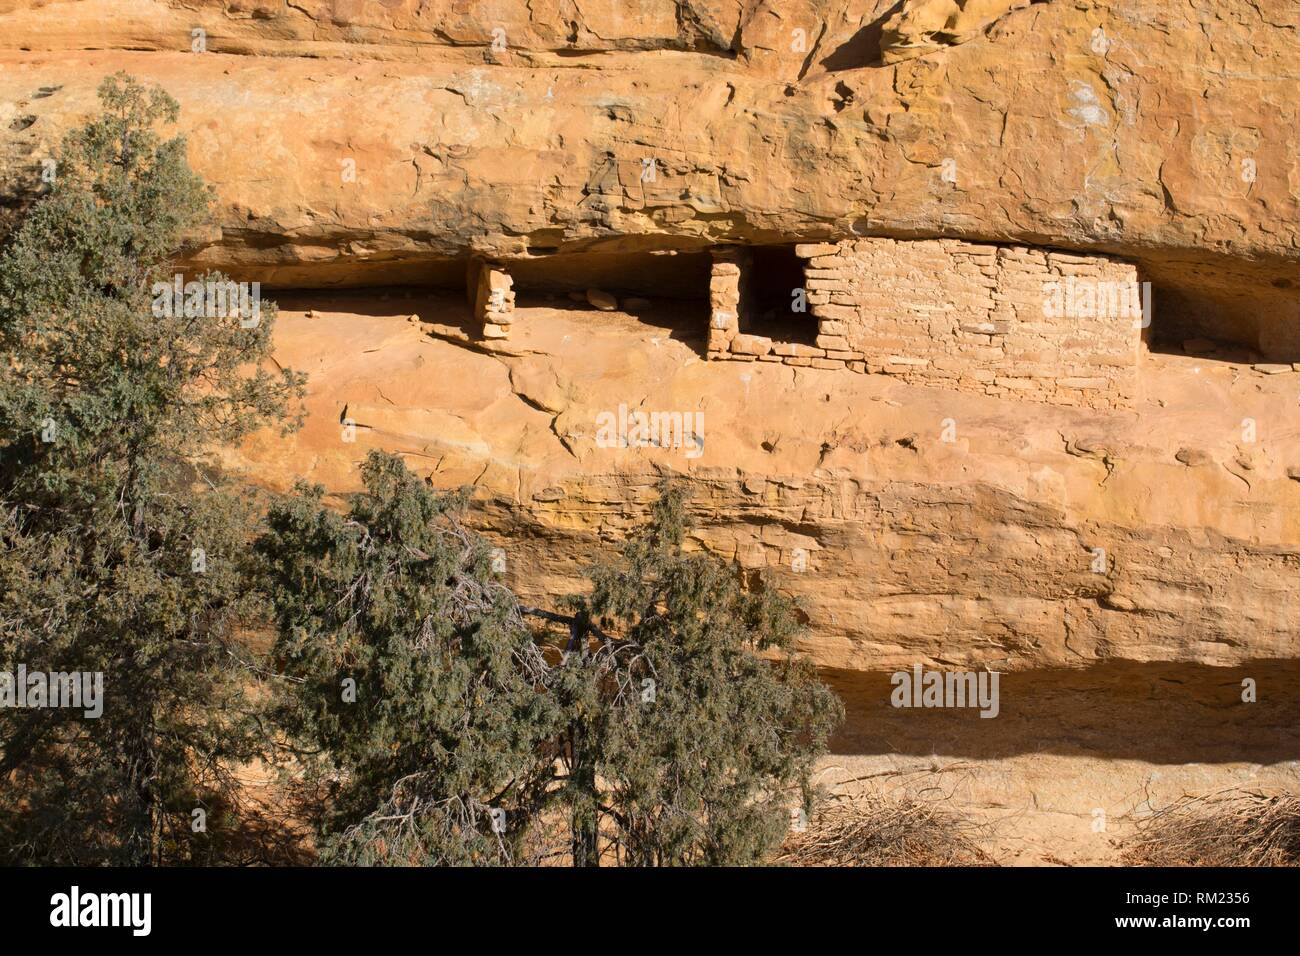 Cliff ruina cerca de abeto House, el Parque Nacional Mesa Verde, Colorado. Imagen De Stock